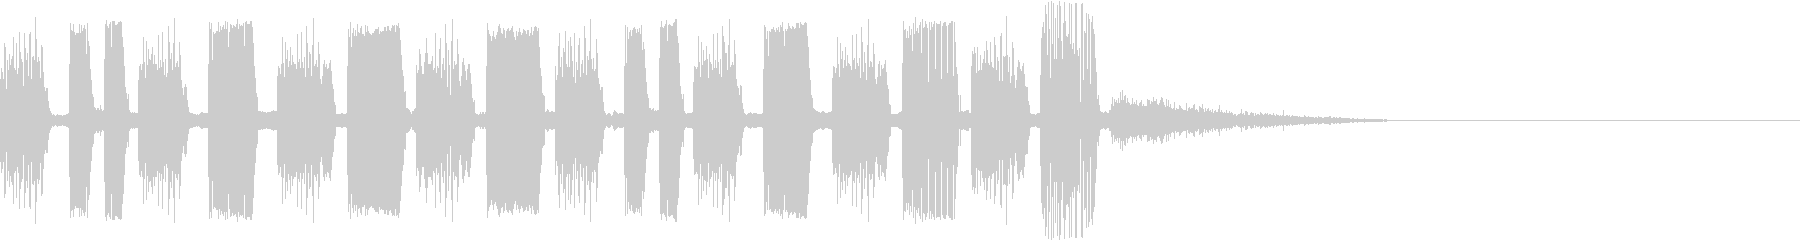 EDMジングルオーソドックスの未再生の波形